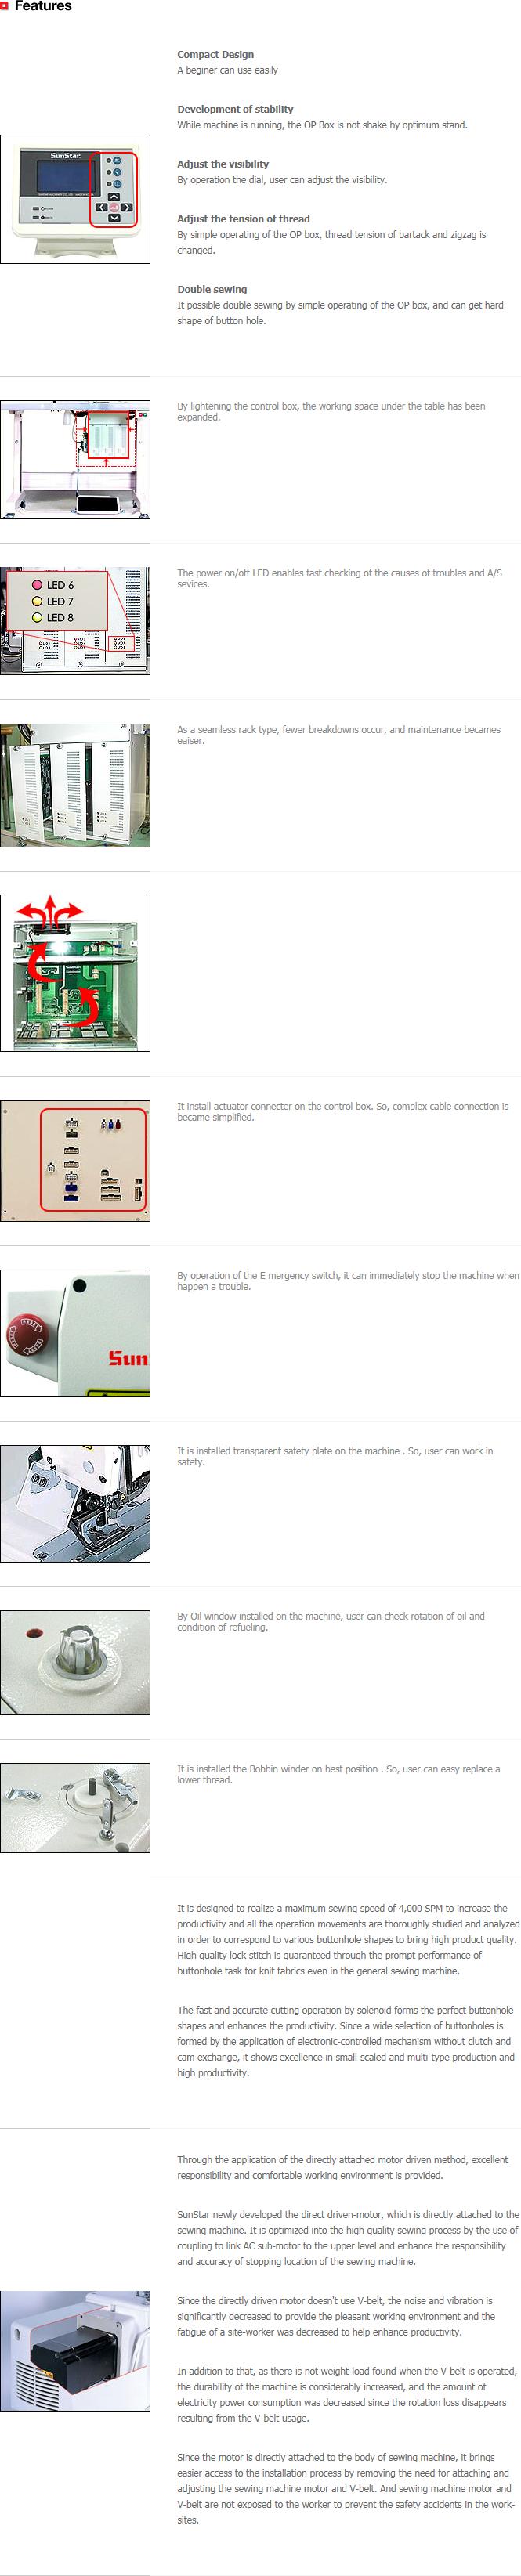 SunStar Button Hole & Eyelet Button SPS/D-BH3000 Series 1